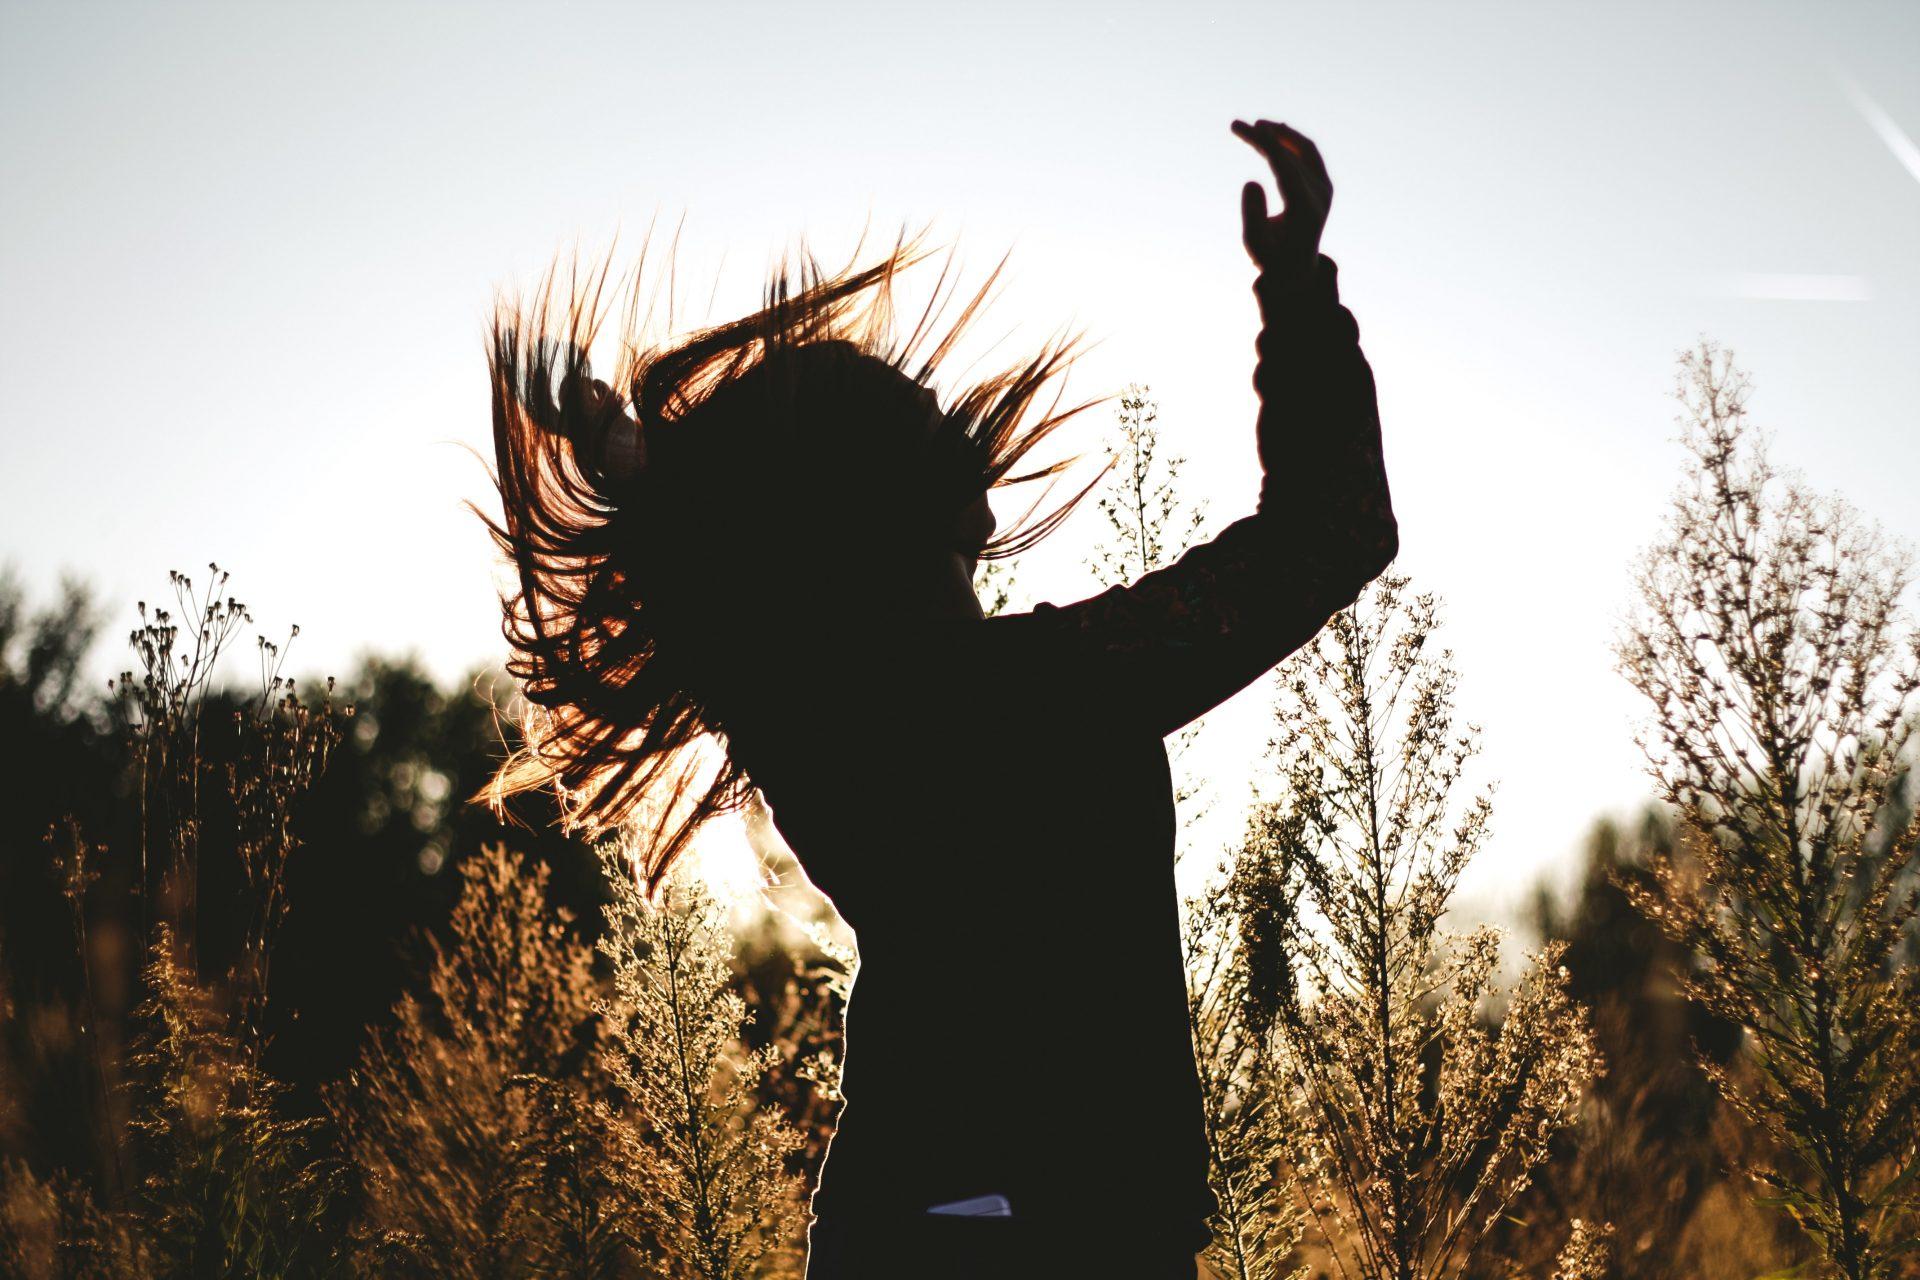 The Dynamite Power of Joy